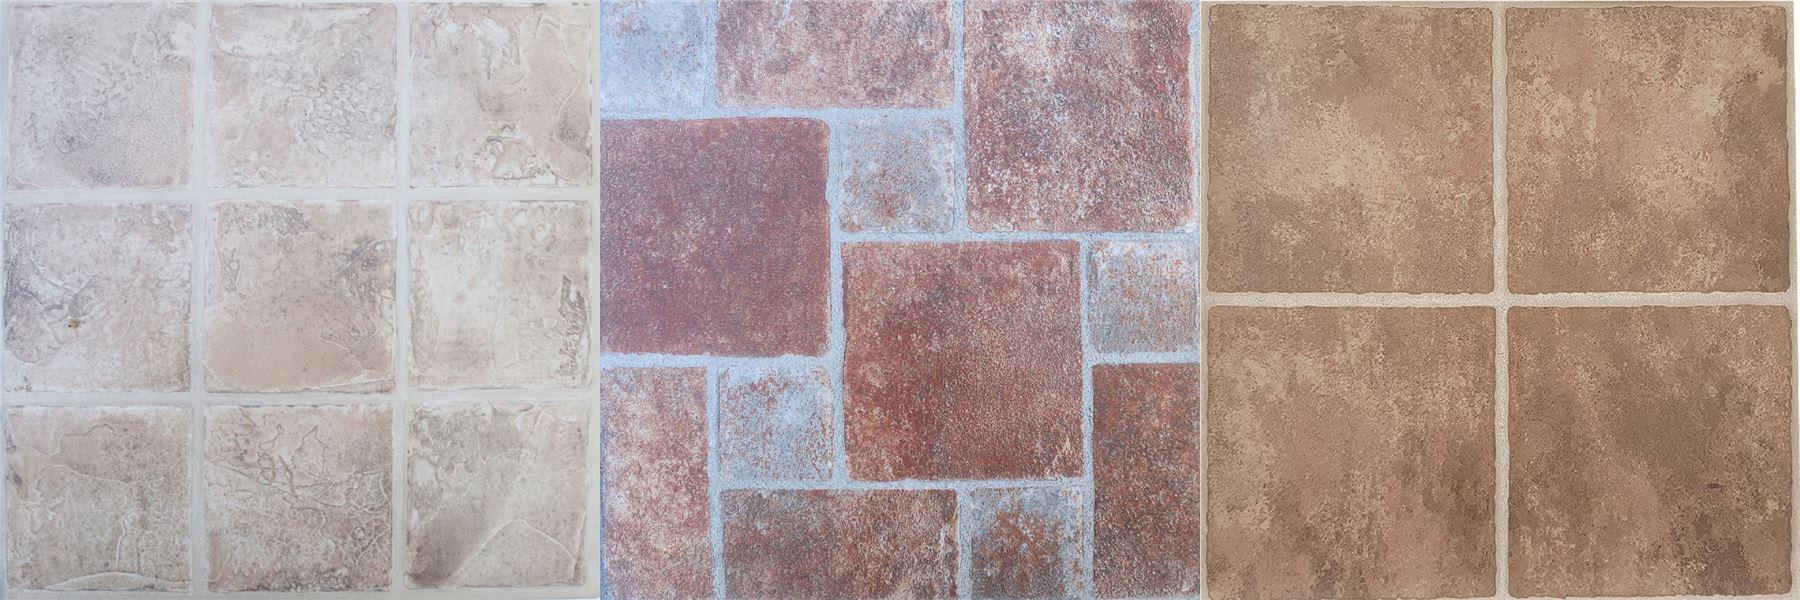 Vinyl Floor Tiles Stone Effect Mosaic Brick Slate Tile Self Adhesive Easy To Fit Ebay